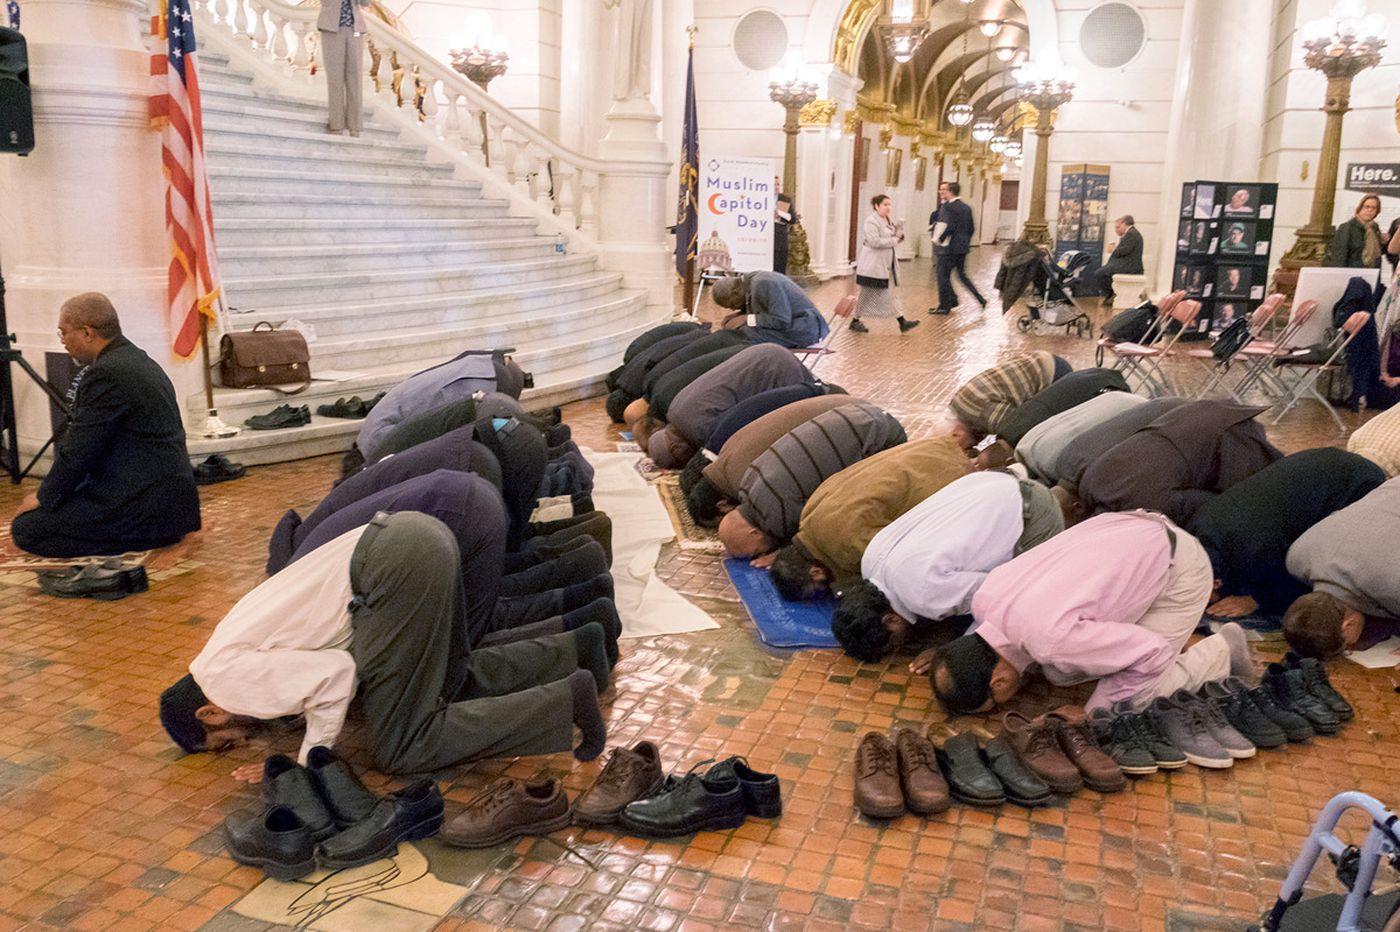 Phila. group lobbies state lawmakers about anti-Muslim bias